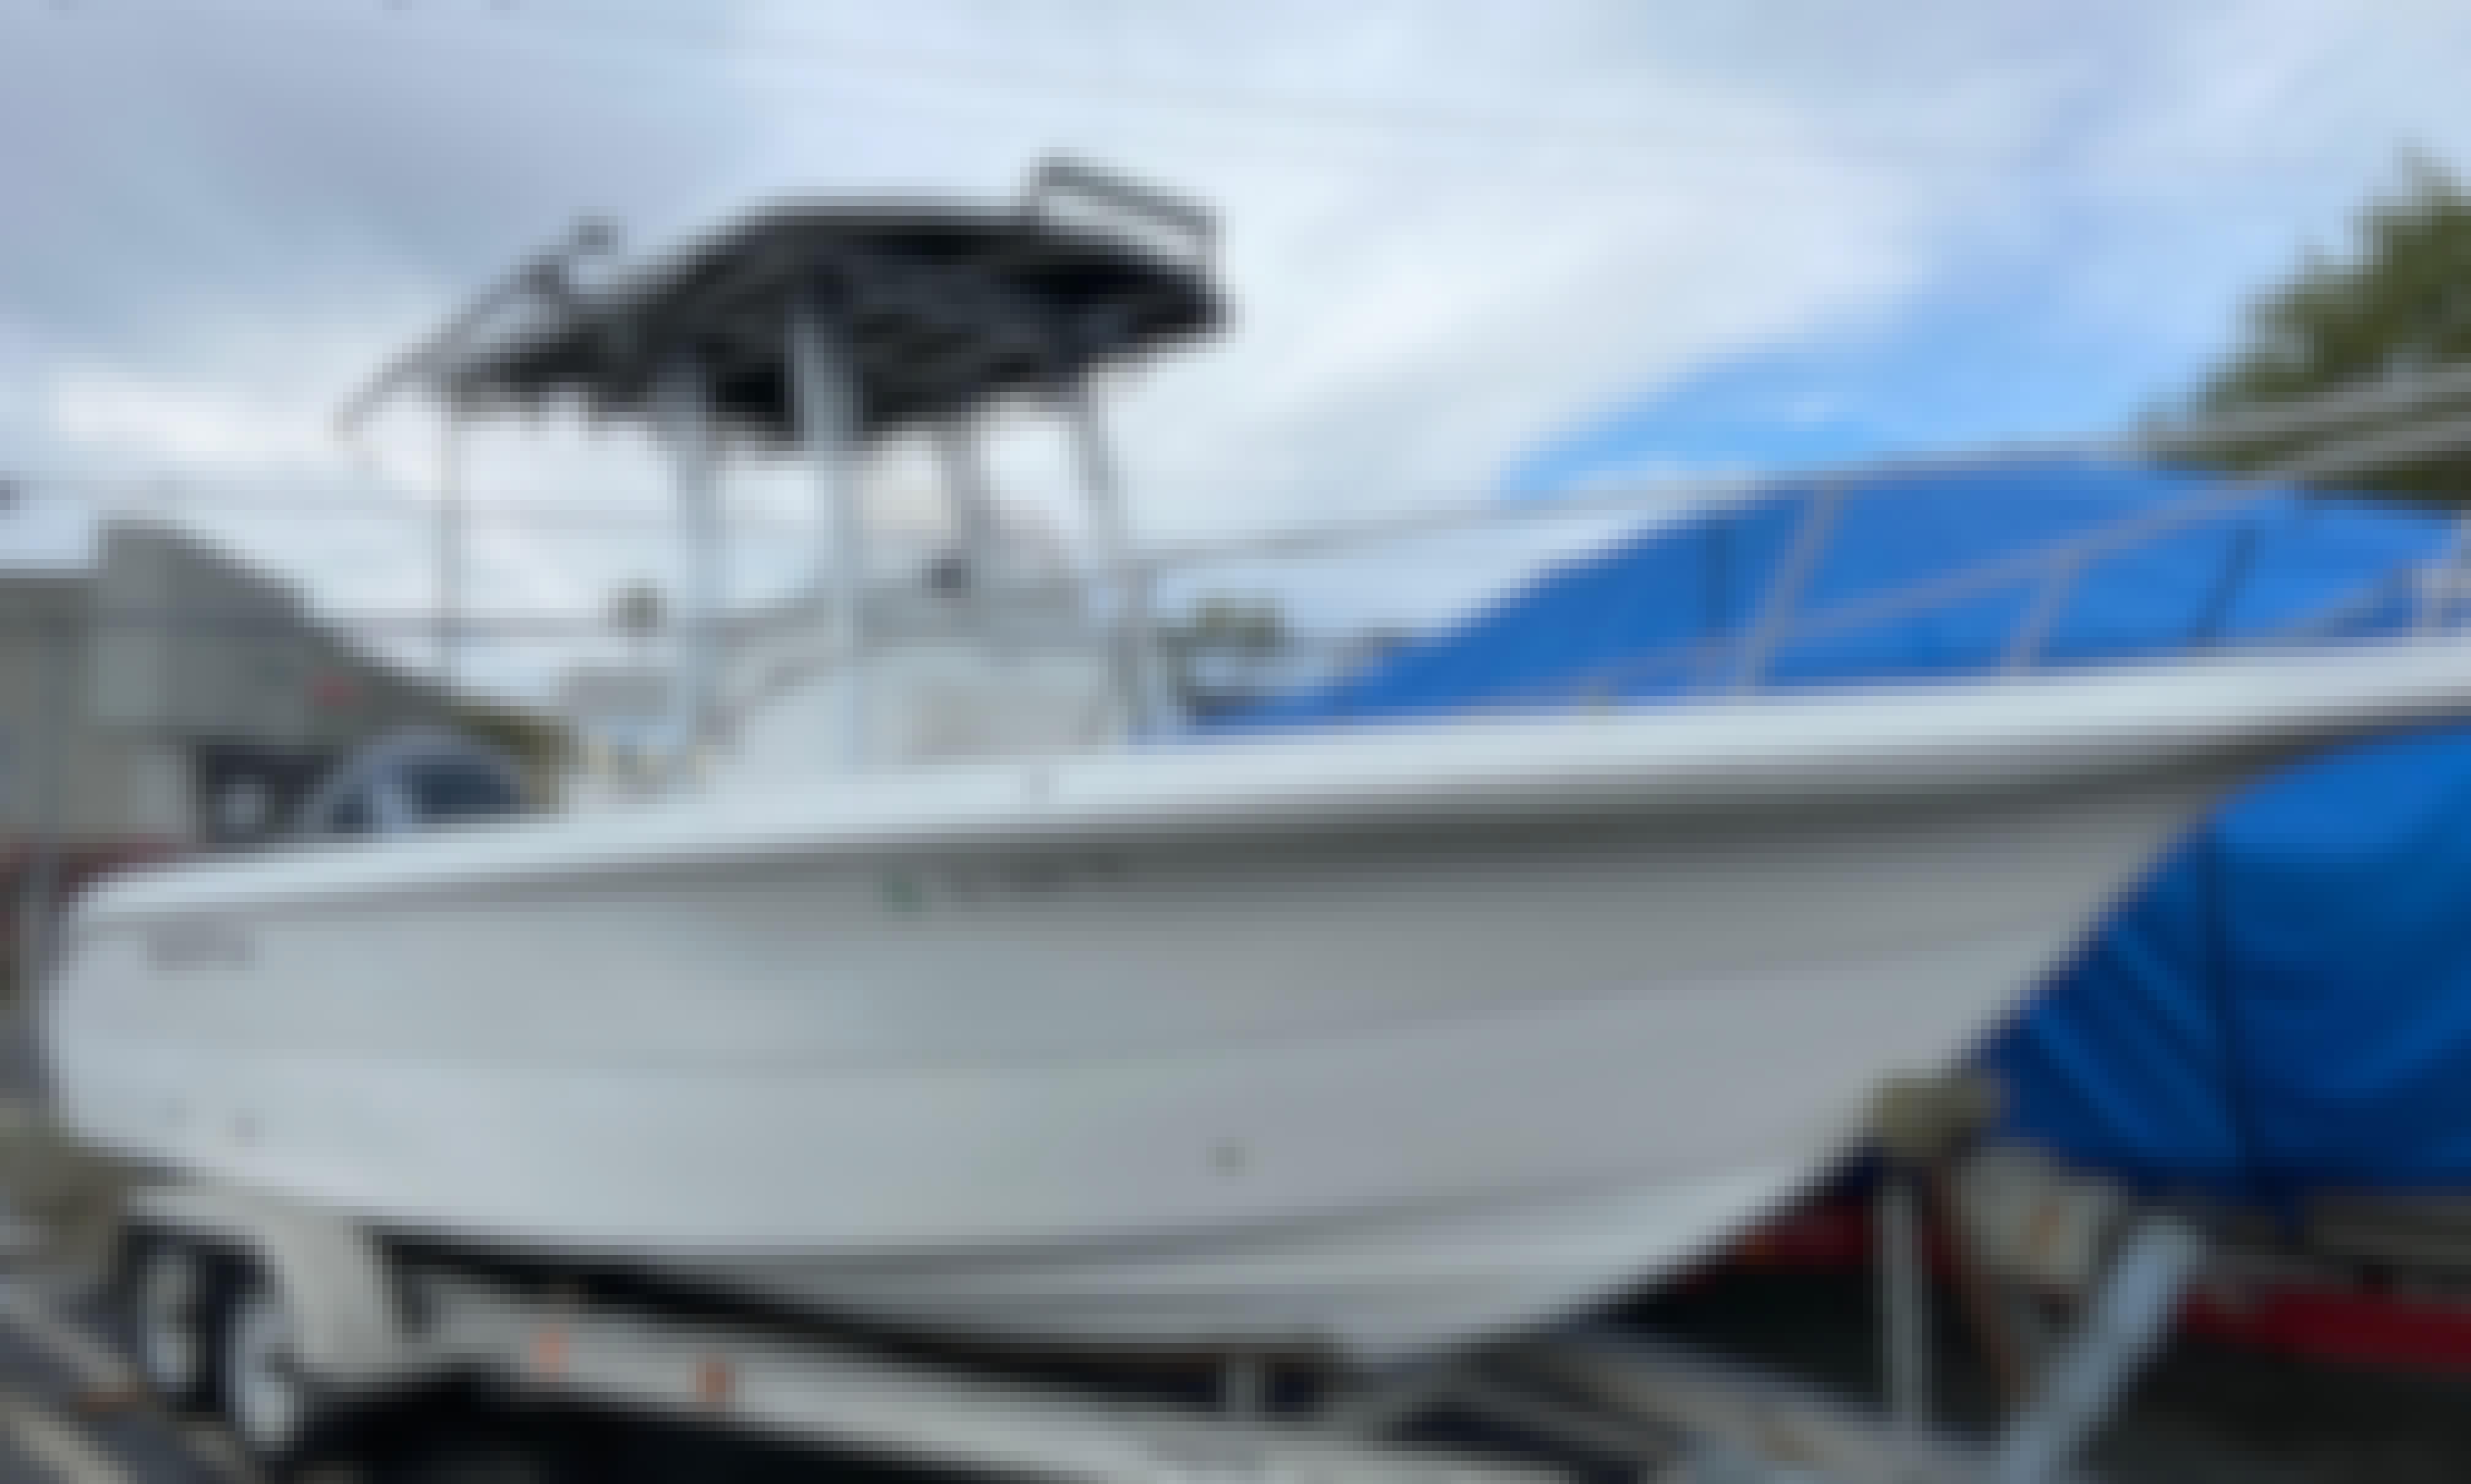 Seafox 230CC Speedy and Spacious Center Console Cruiser!